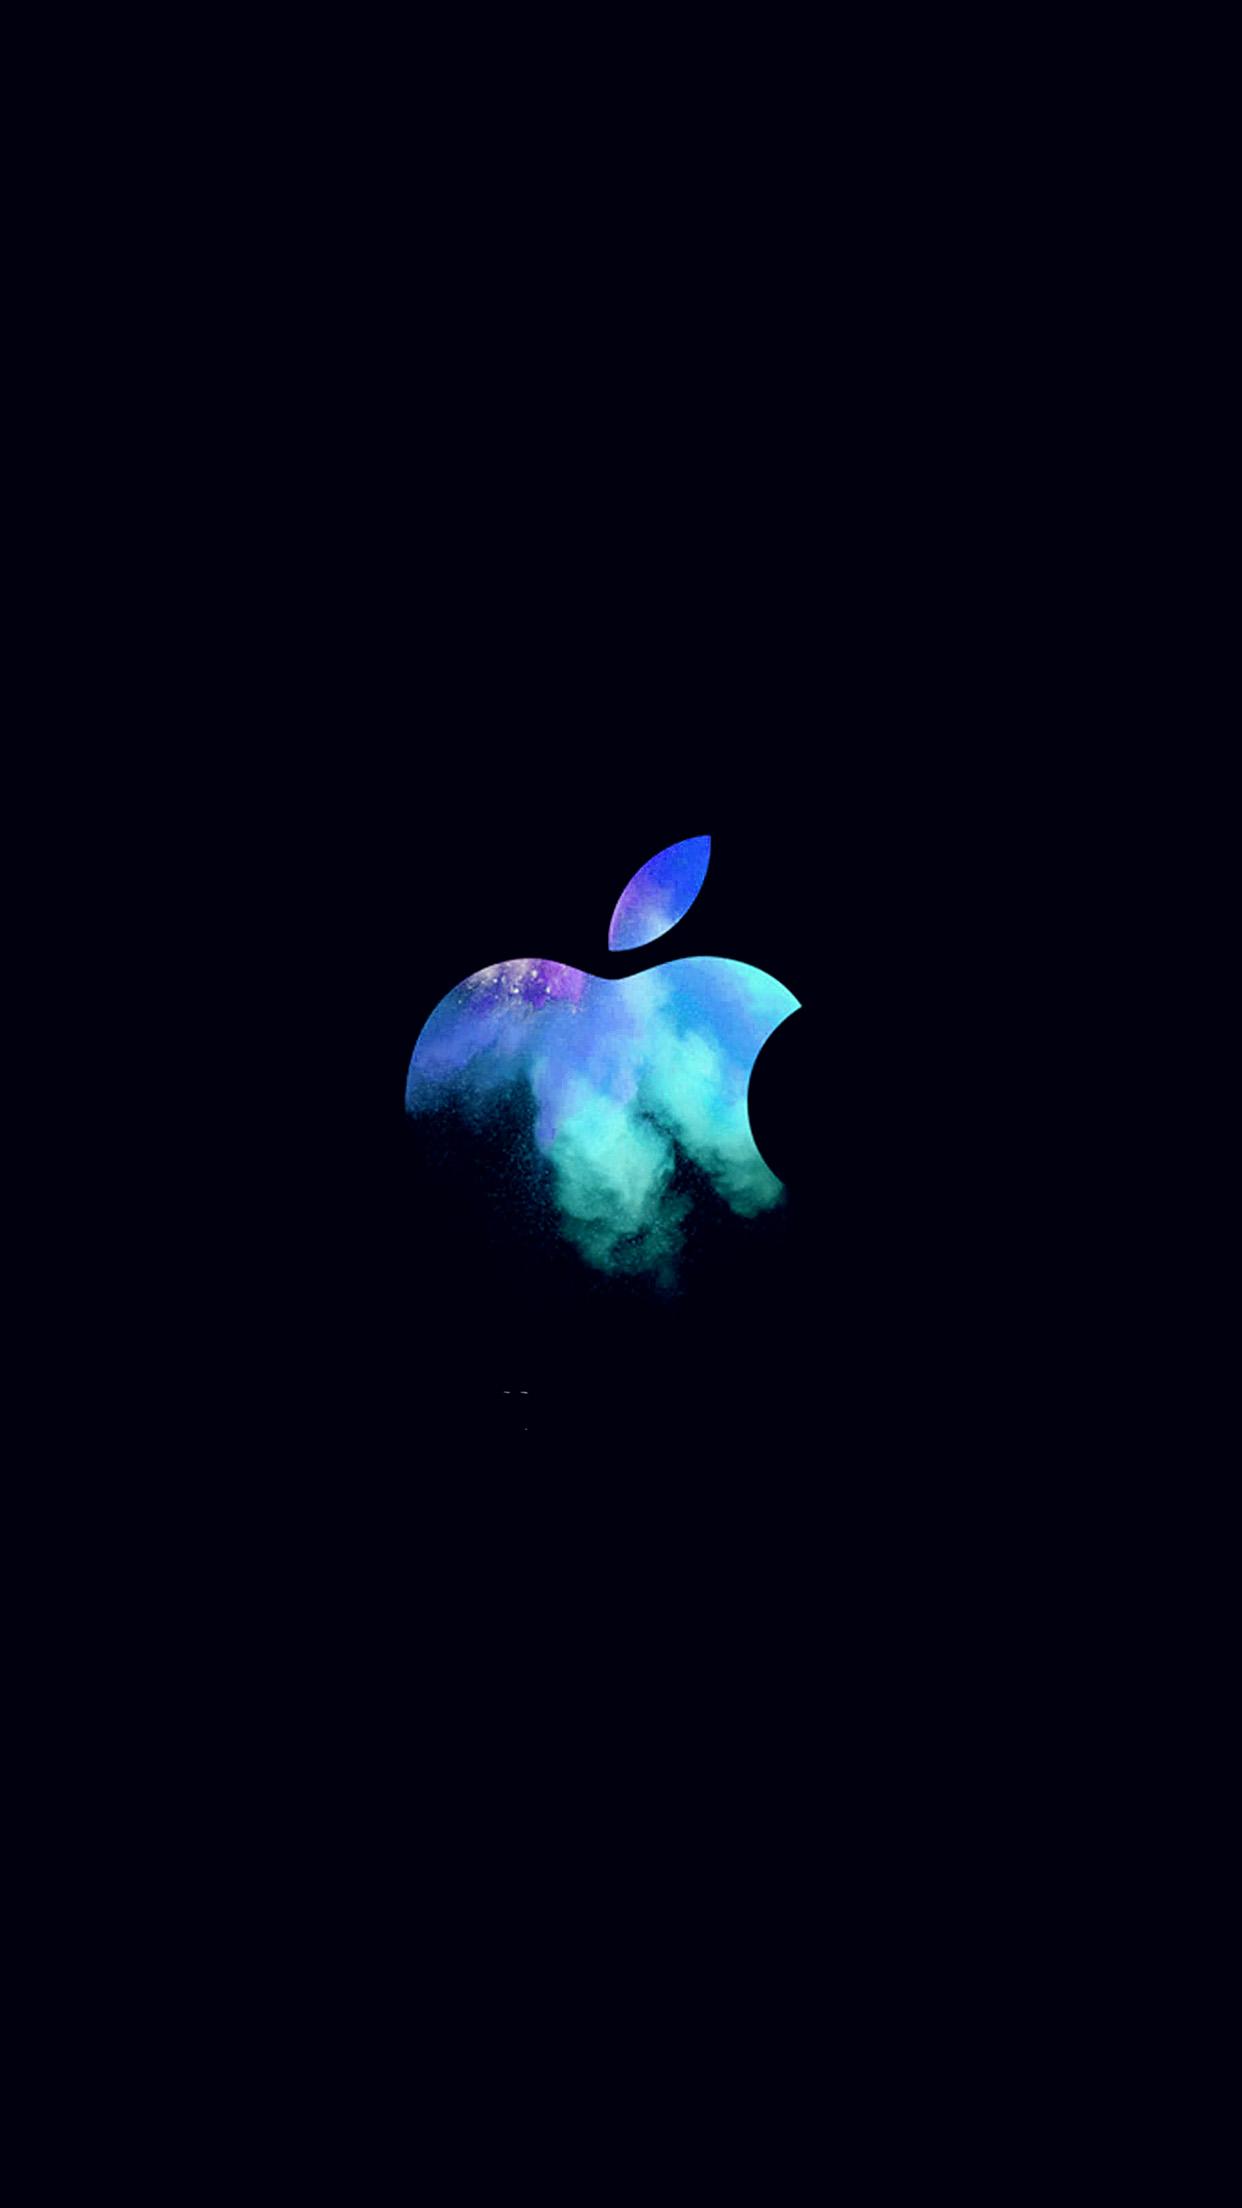 67 Apple Macintosh Wallpaper On Wallpapersafari